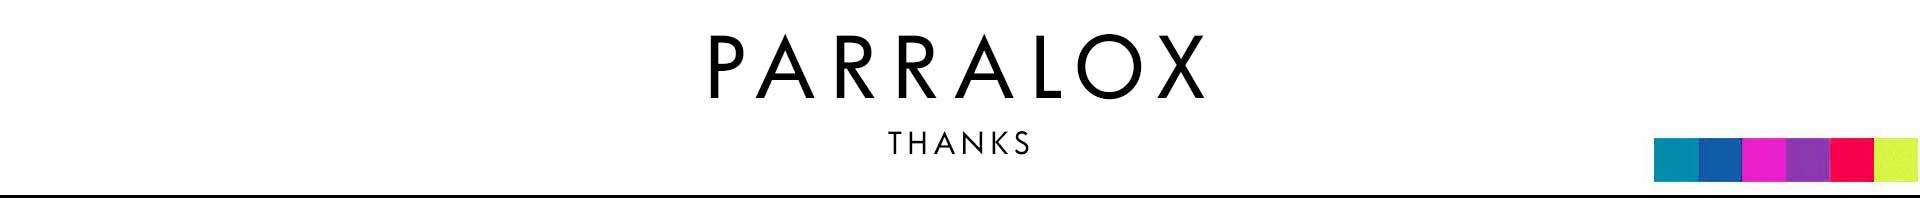 Parralox - Thanks